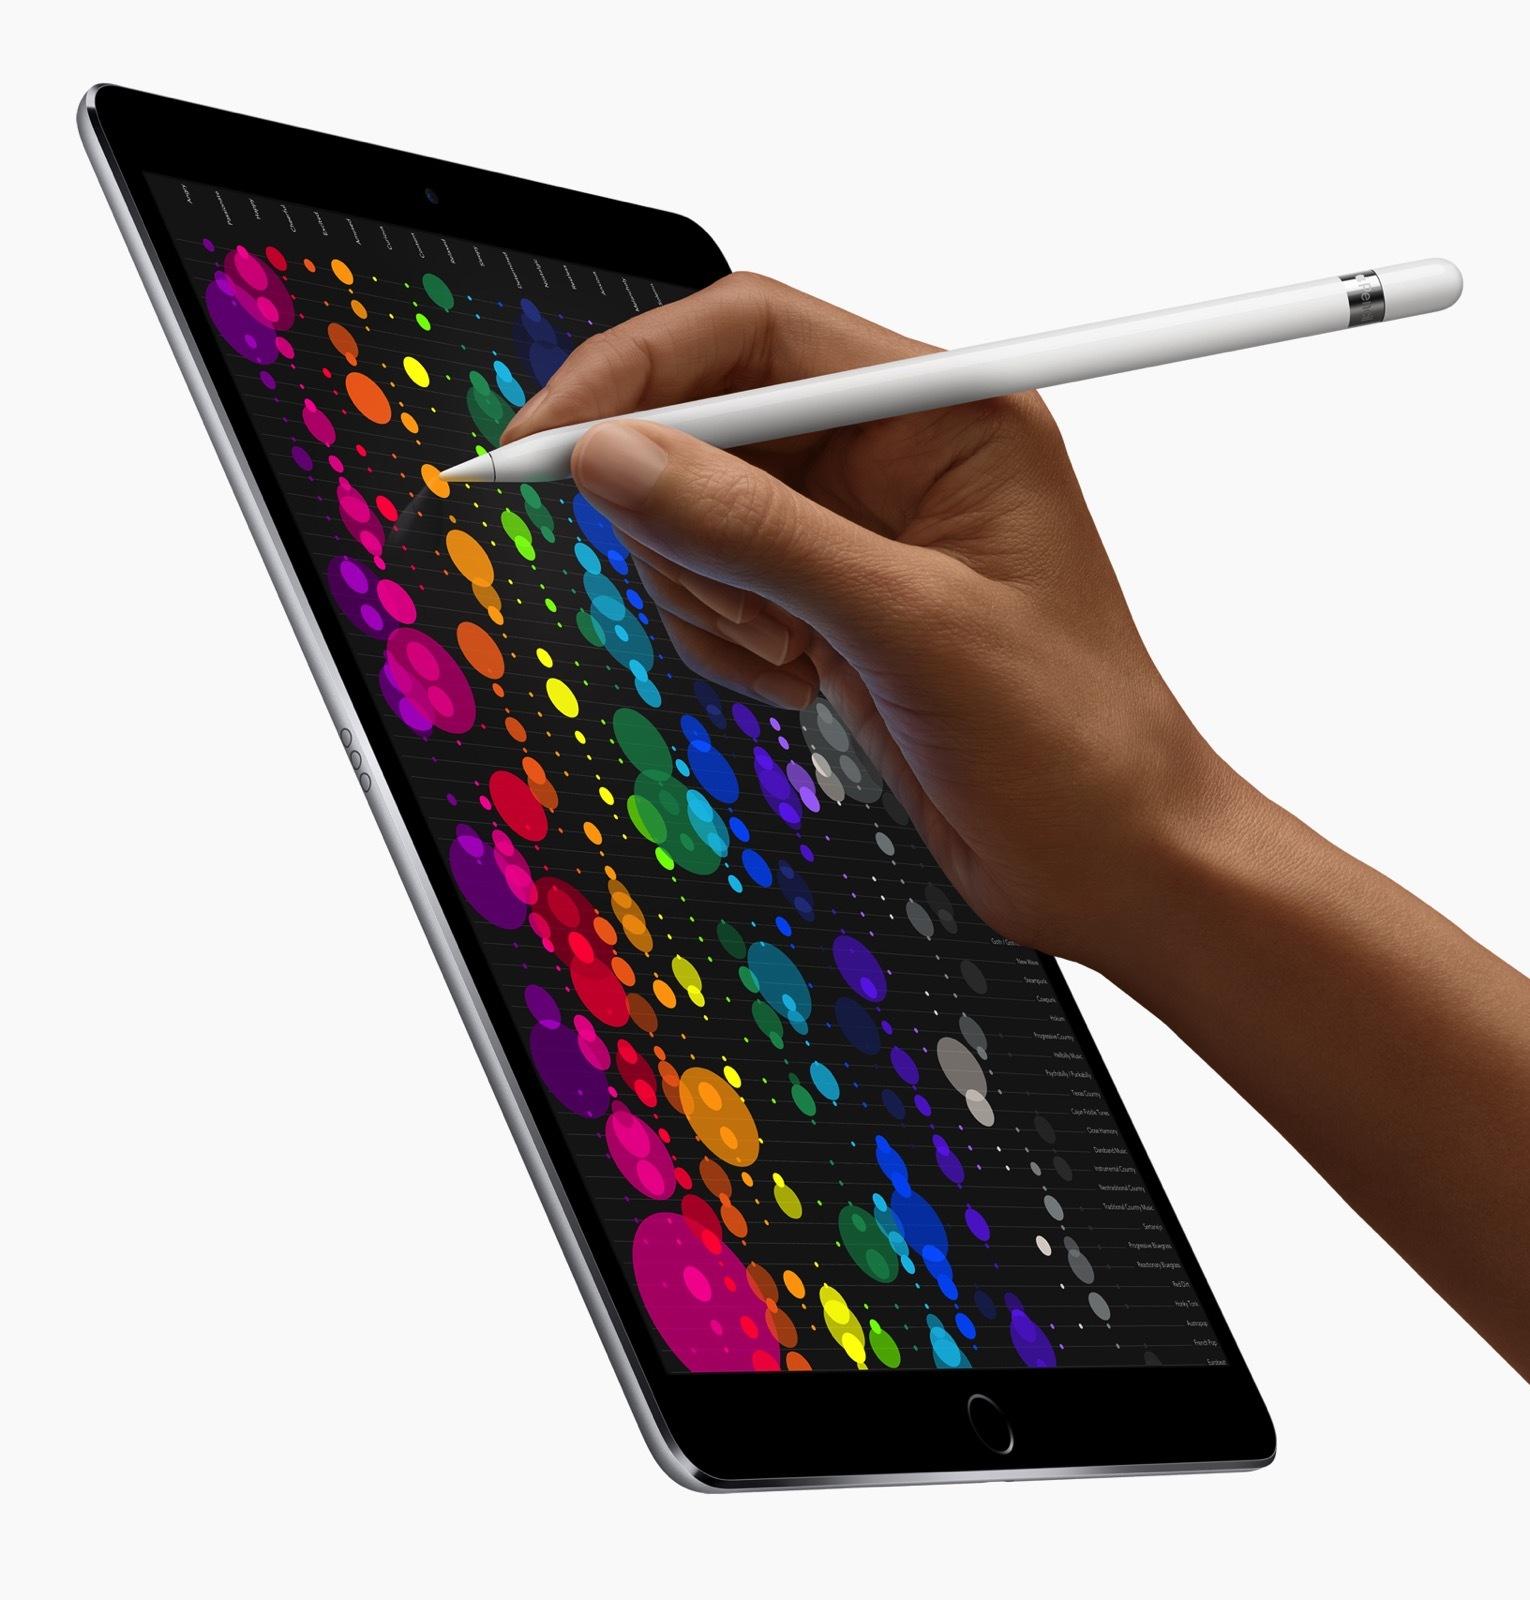 Apple iPad Pro 2017 Pencil